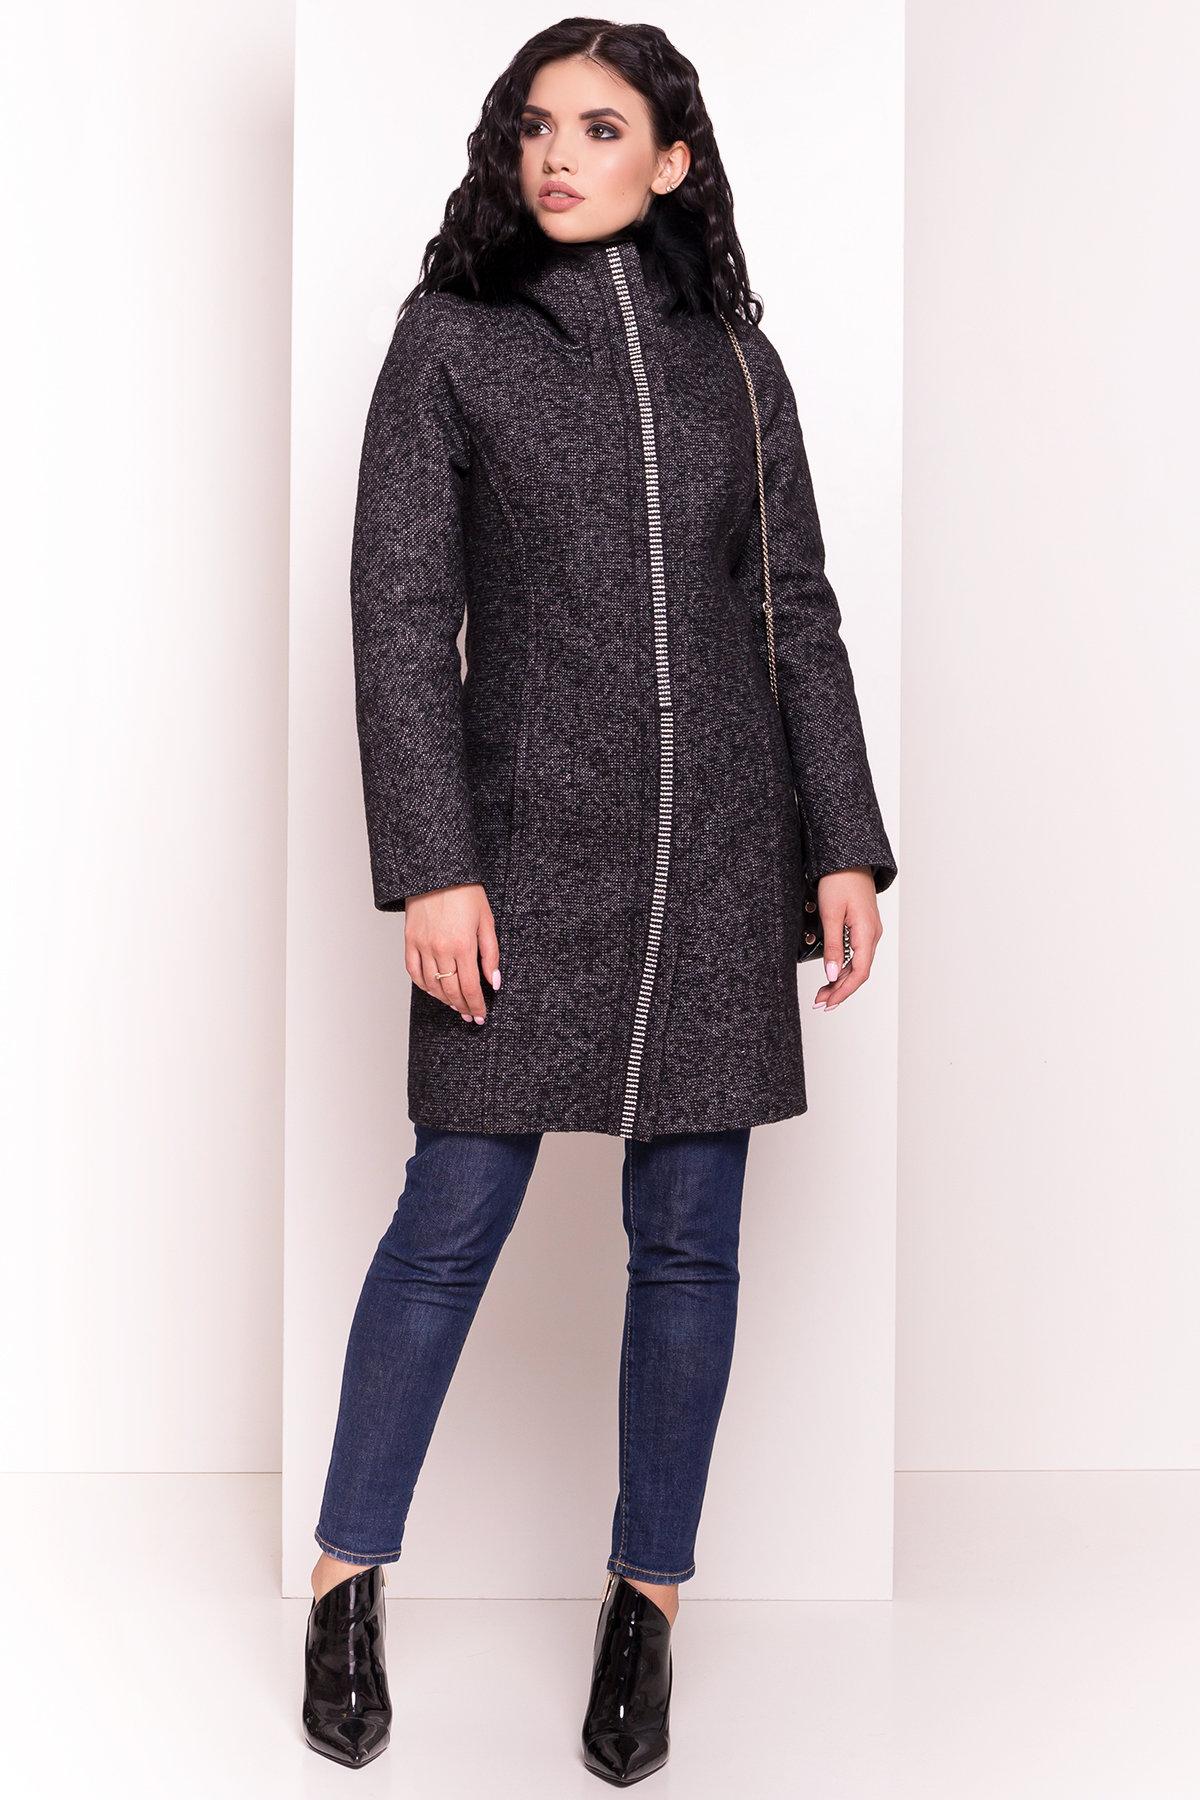 Пальто зима Дакар 4447 АРТ. 5237 Цвет: Черный белый - фото 1, интернет магазин tm-modus.ru